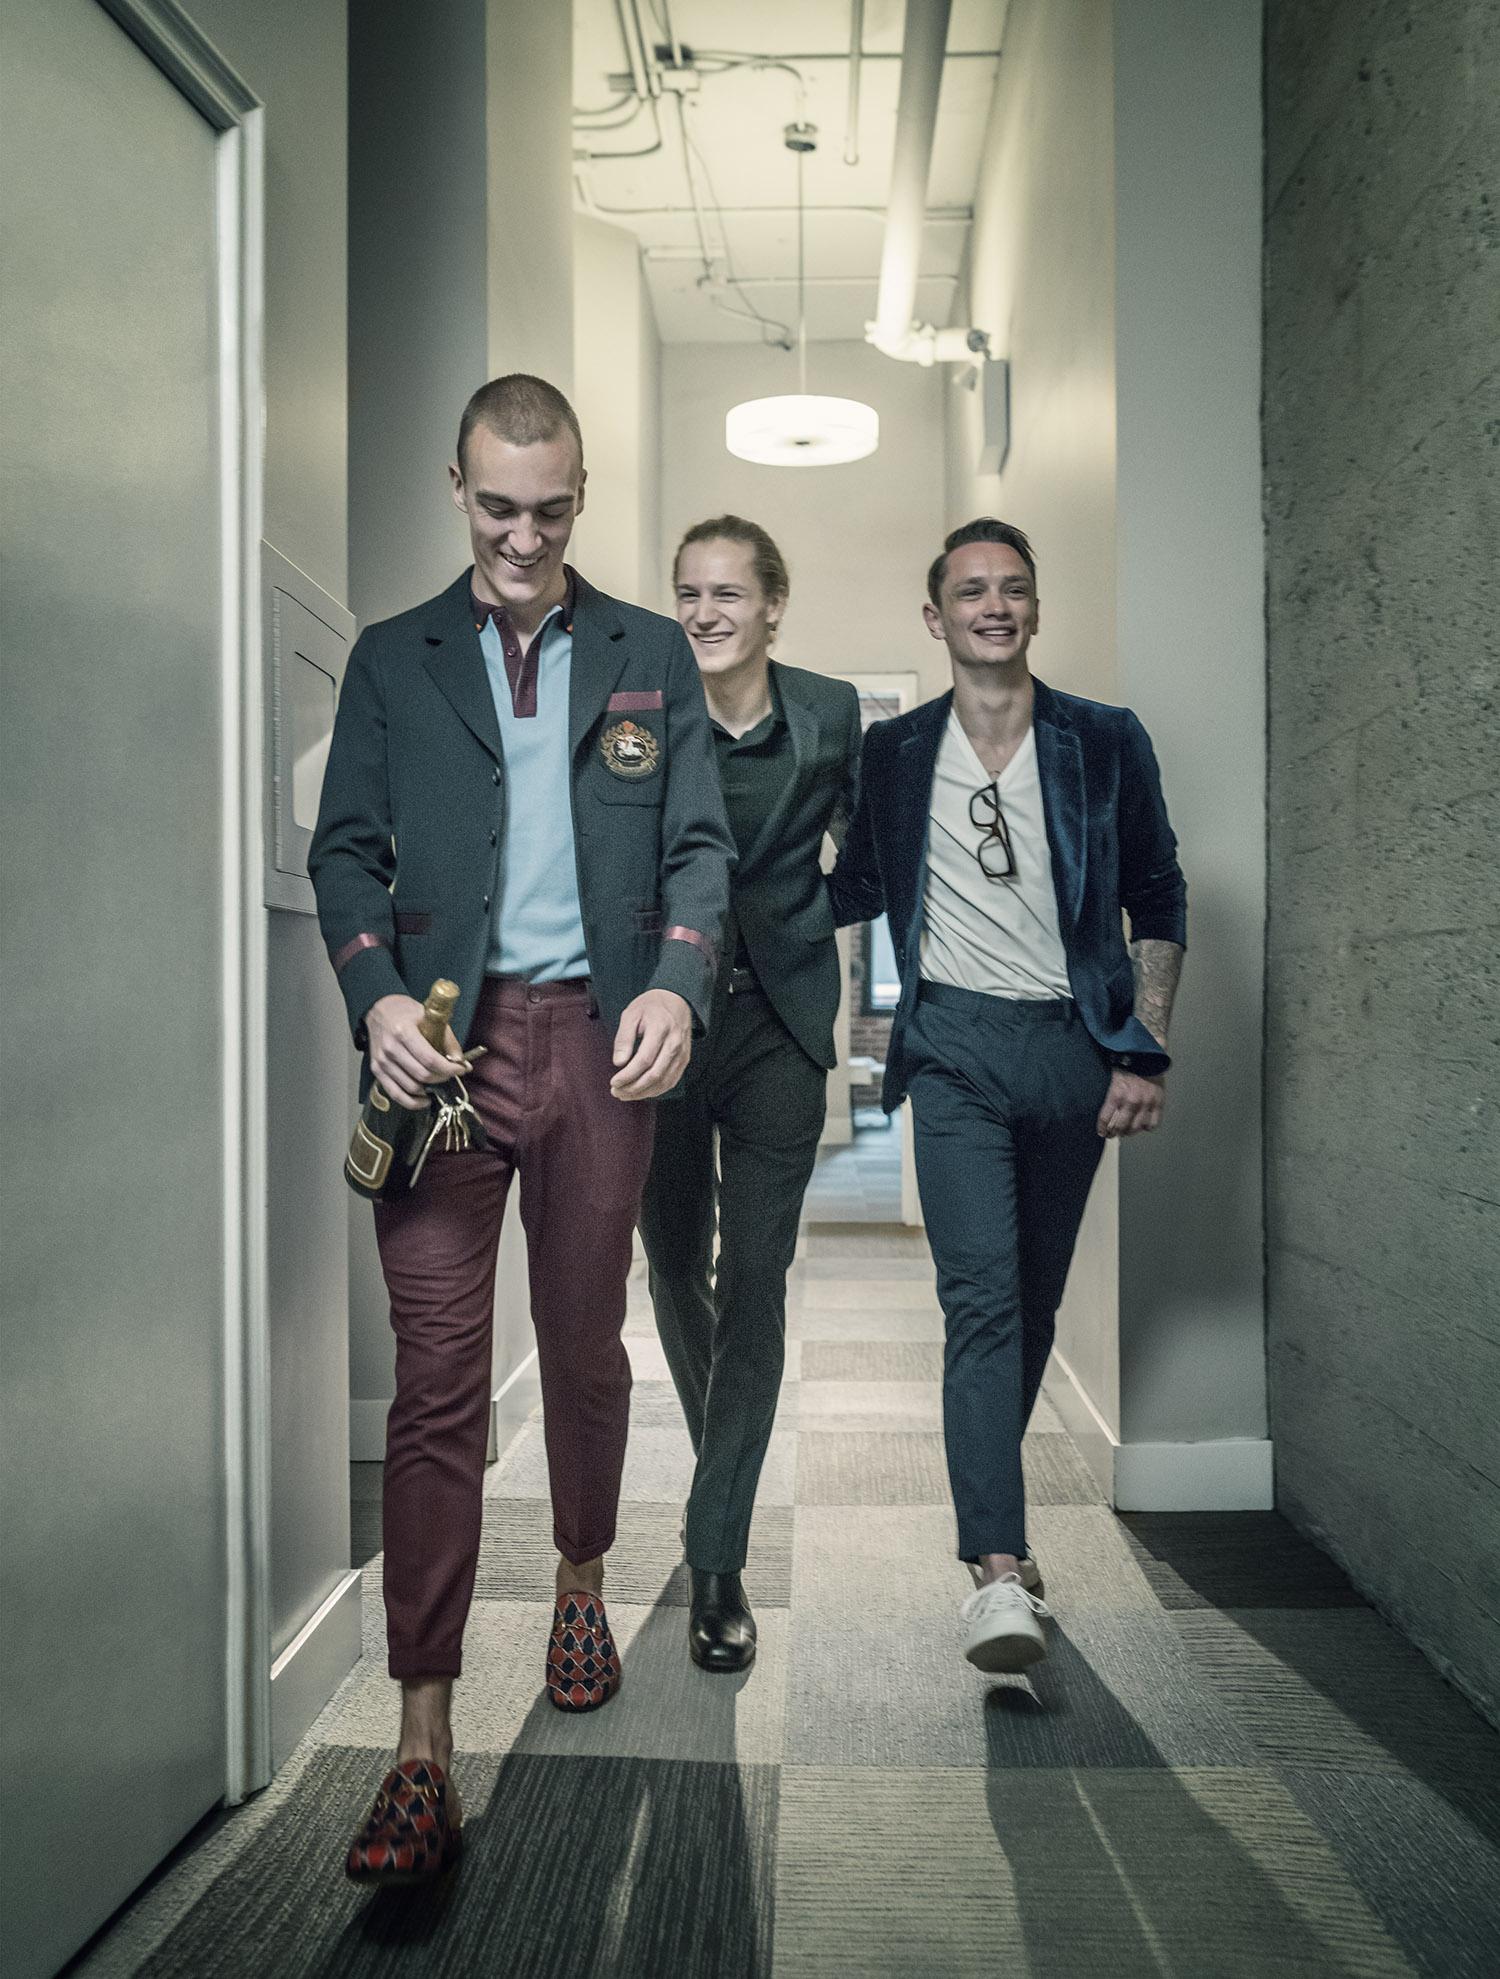 FREQ Magazine  Clothing: Holt Renfrew  Photographer: Gerard Yunker  Talent: Mode Models